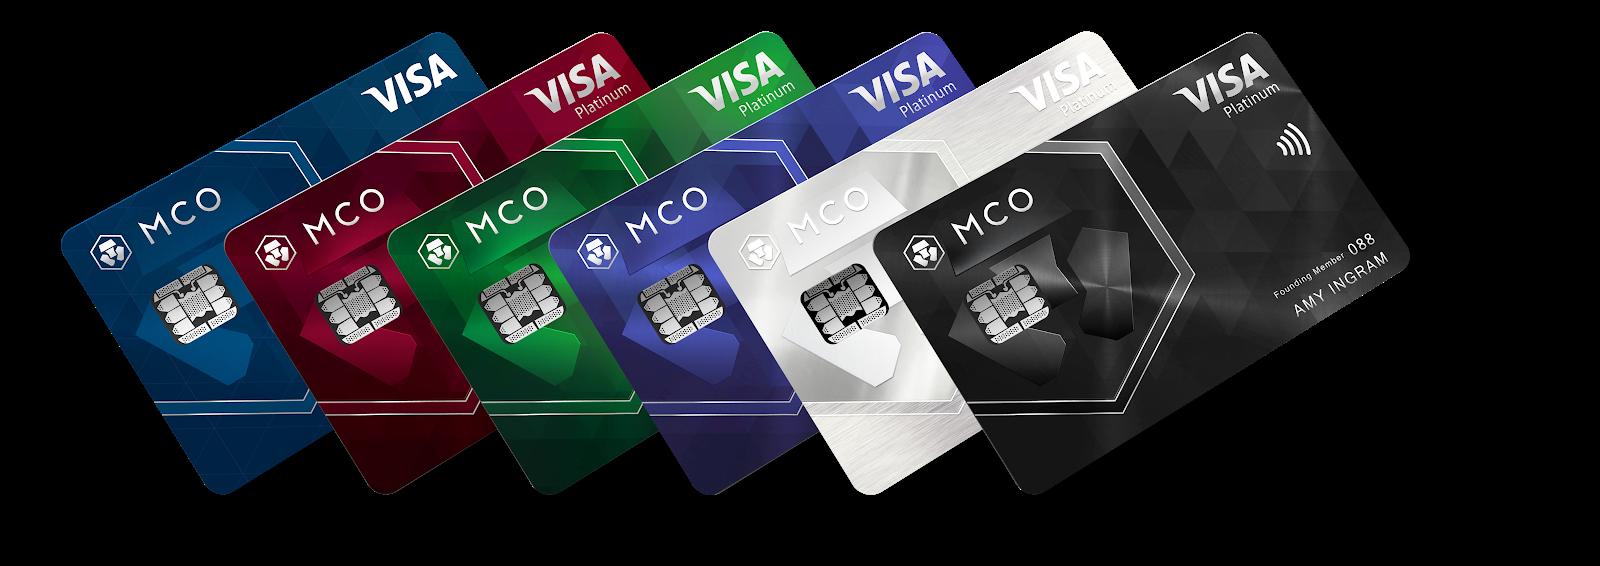 Crypto.com Bitcoin Card Visa